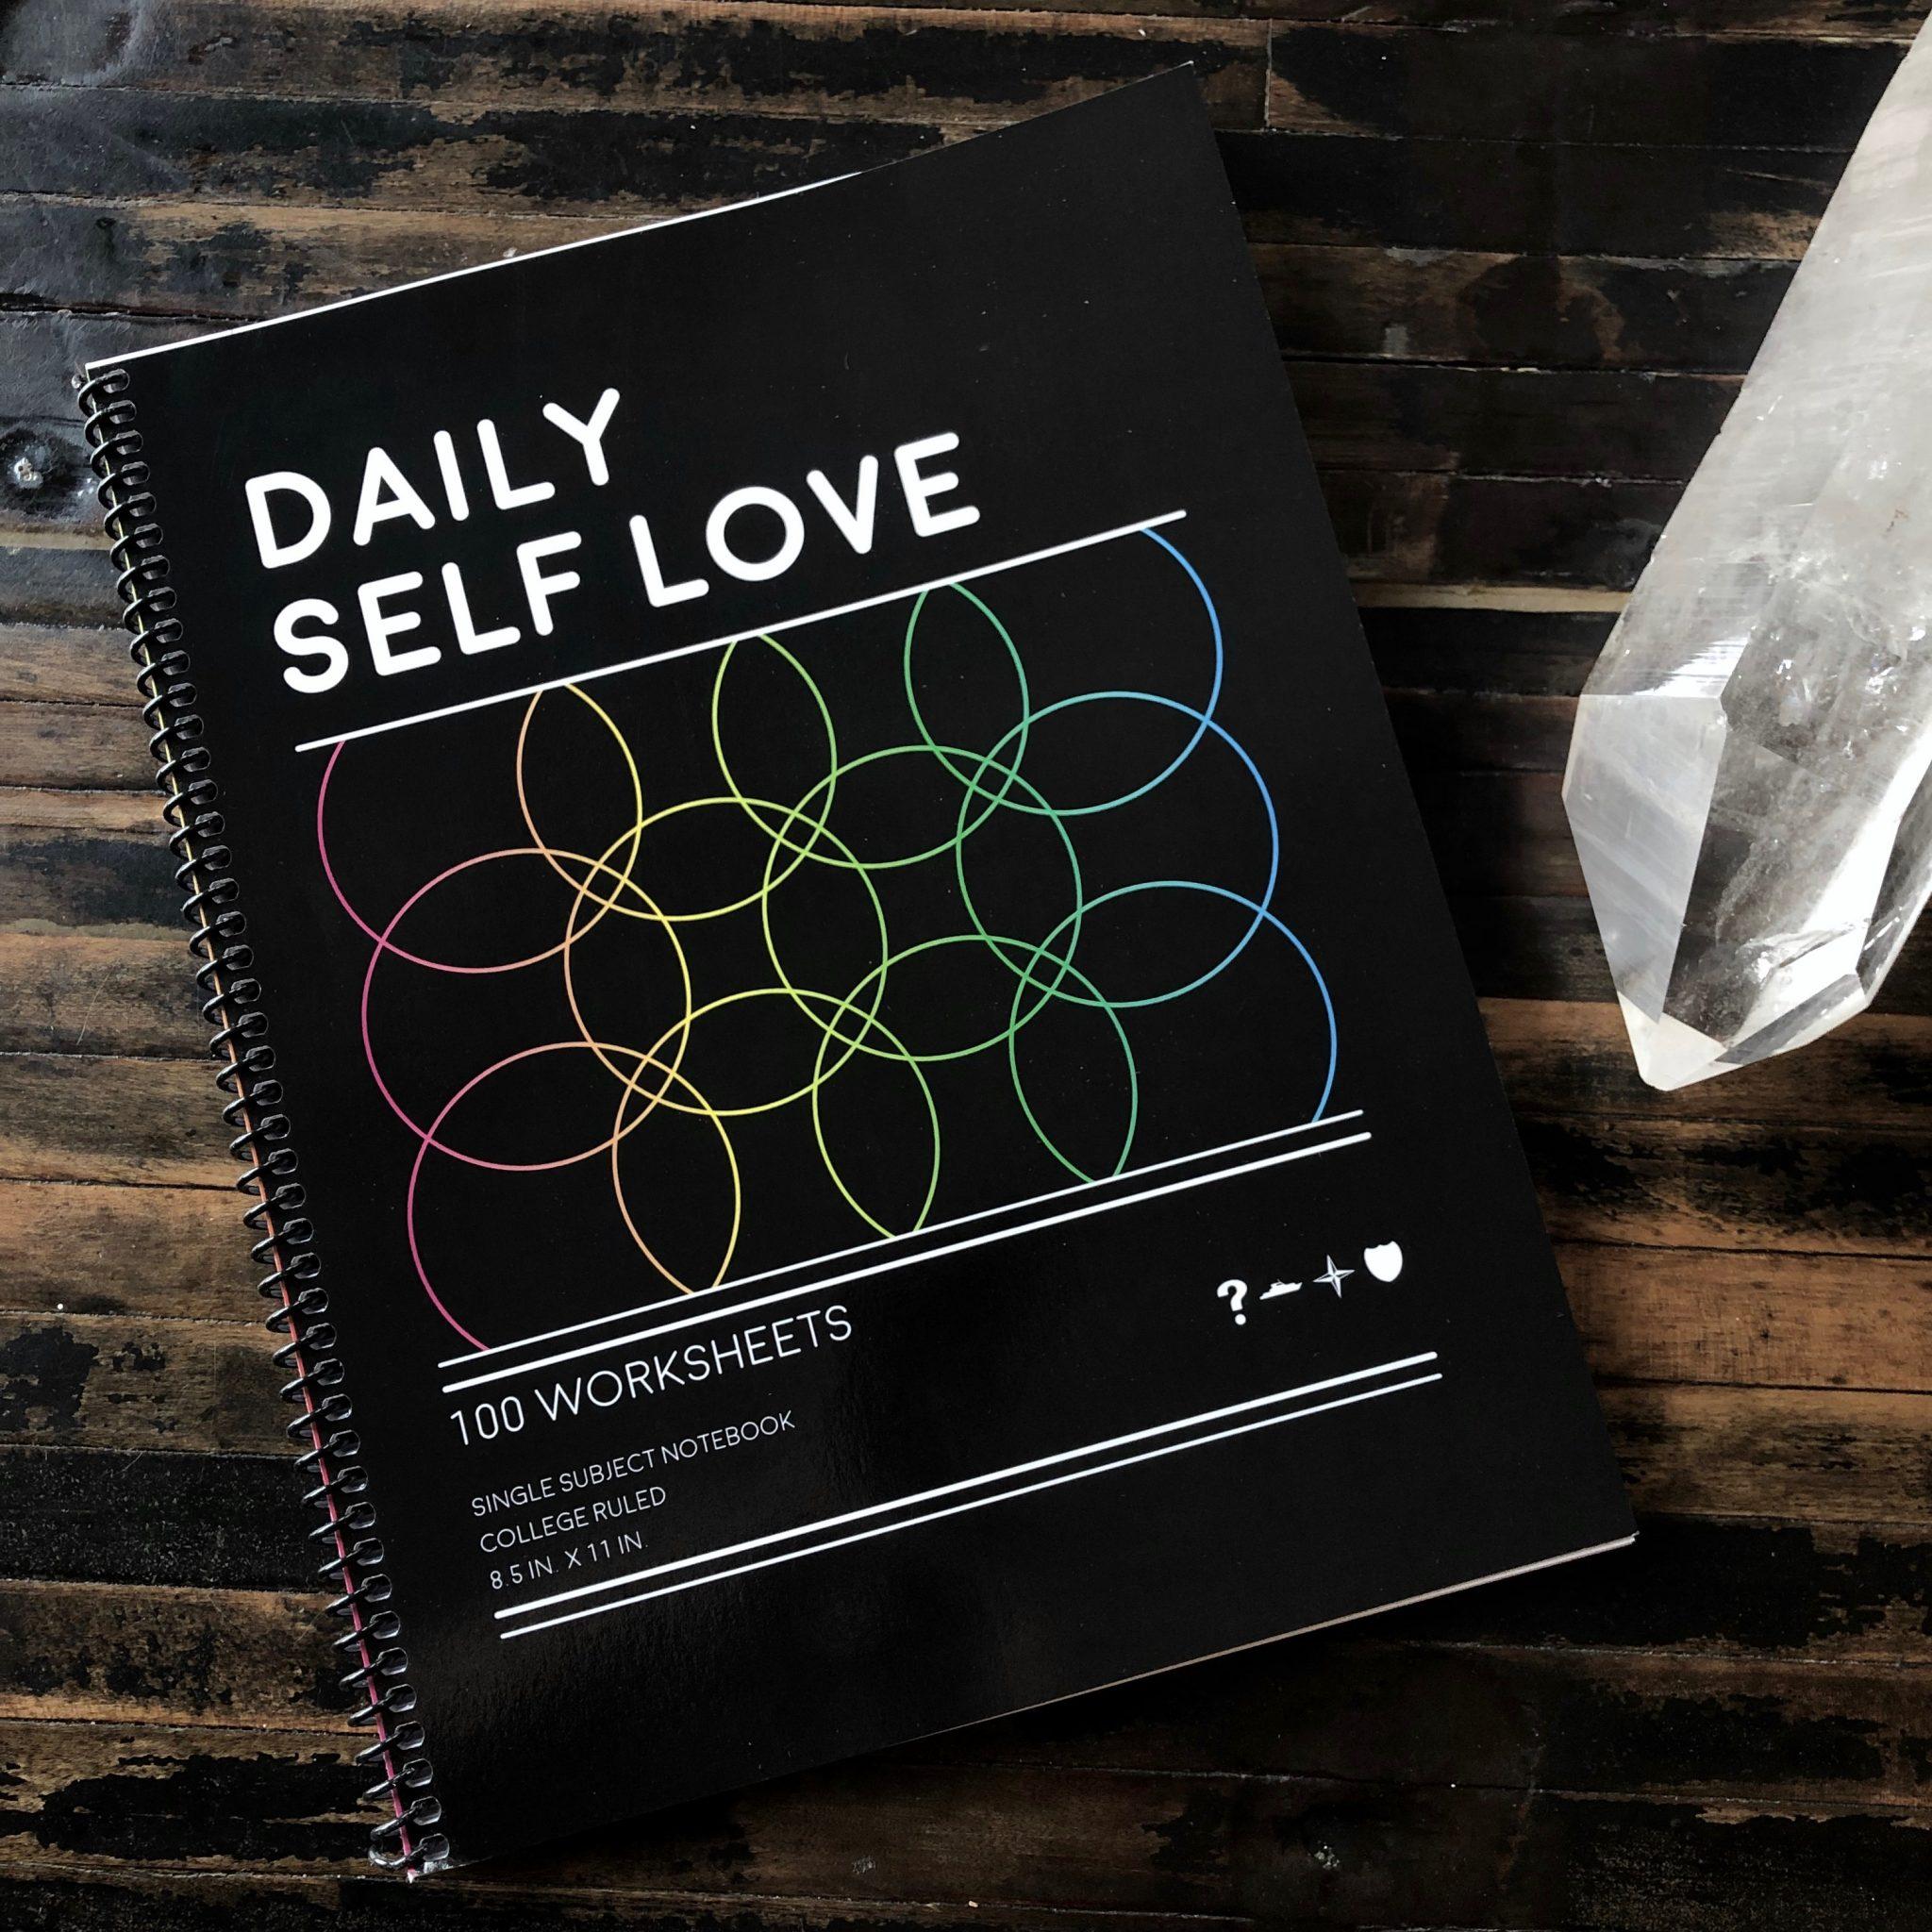 Daily Self Love Worksheet